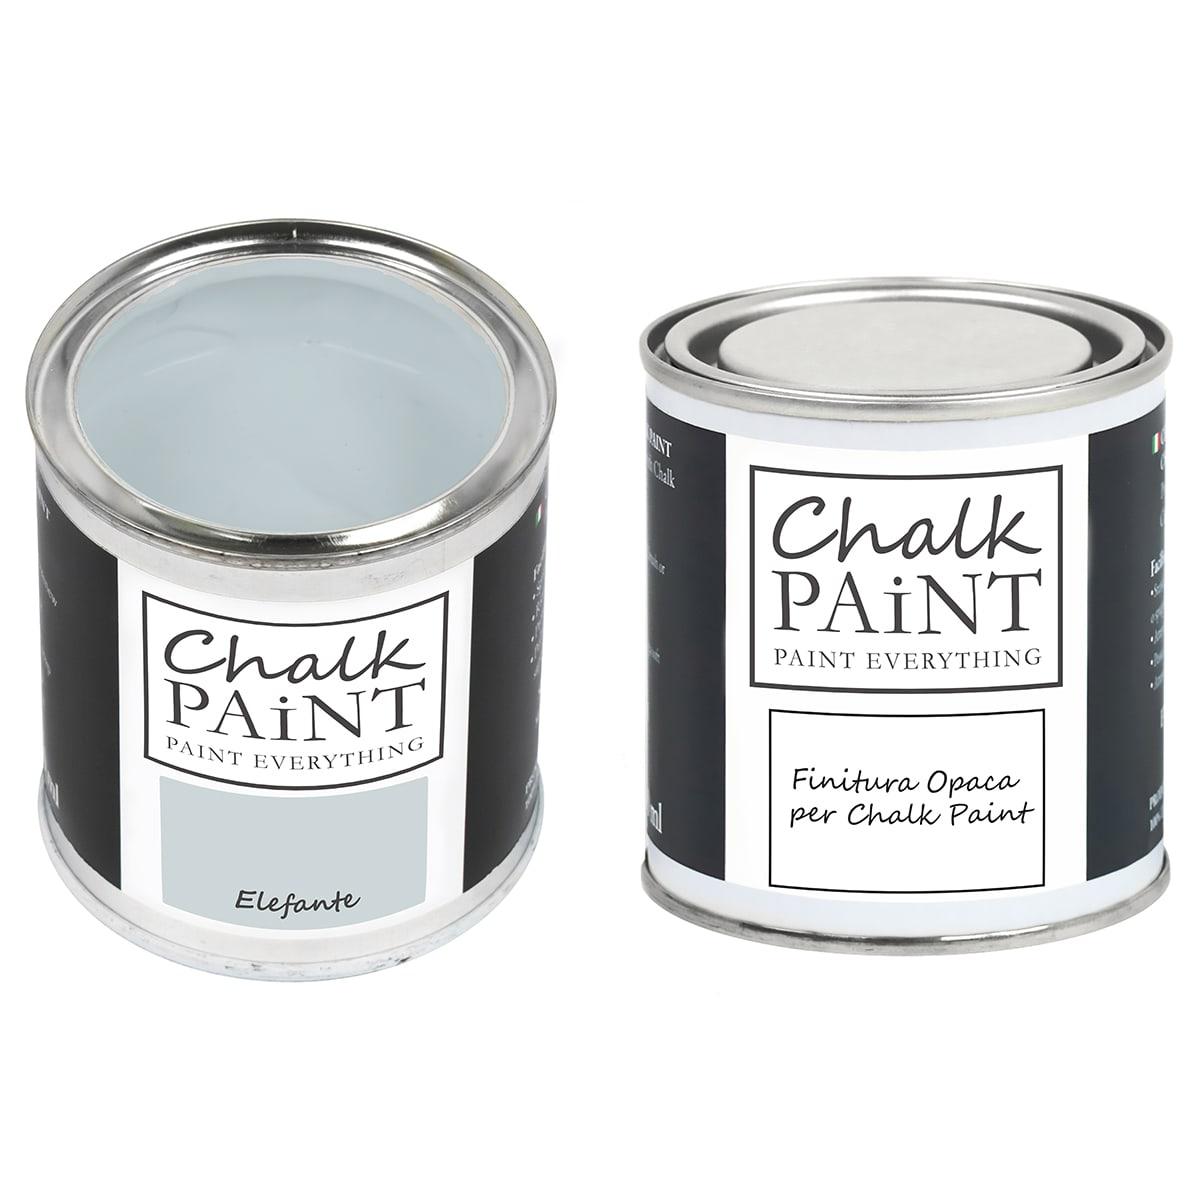 Chalk Paint Elefante + Finitura